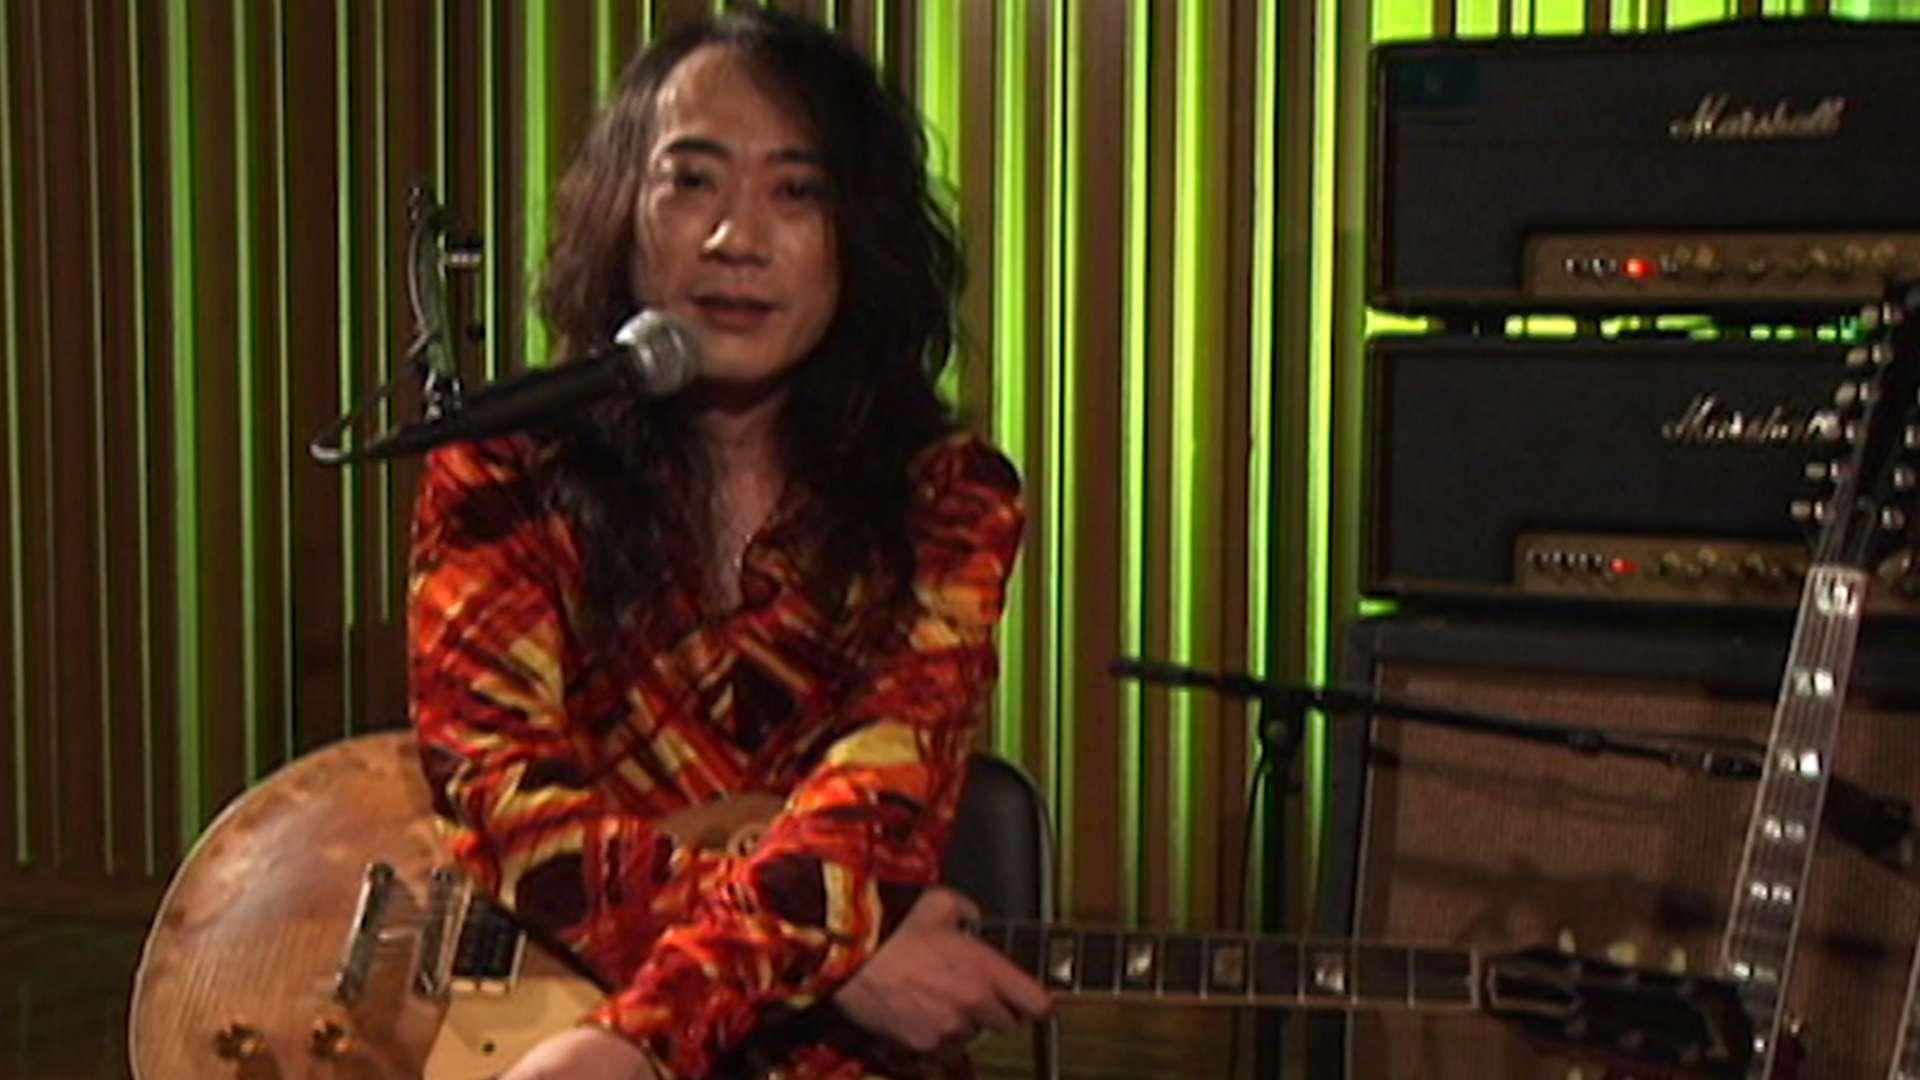 PATA 直伝 Improvisation Guitar Style